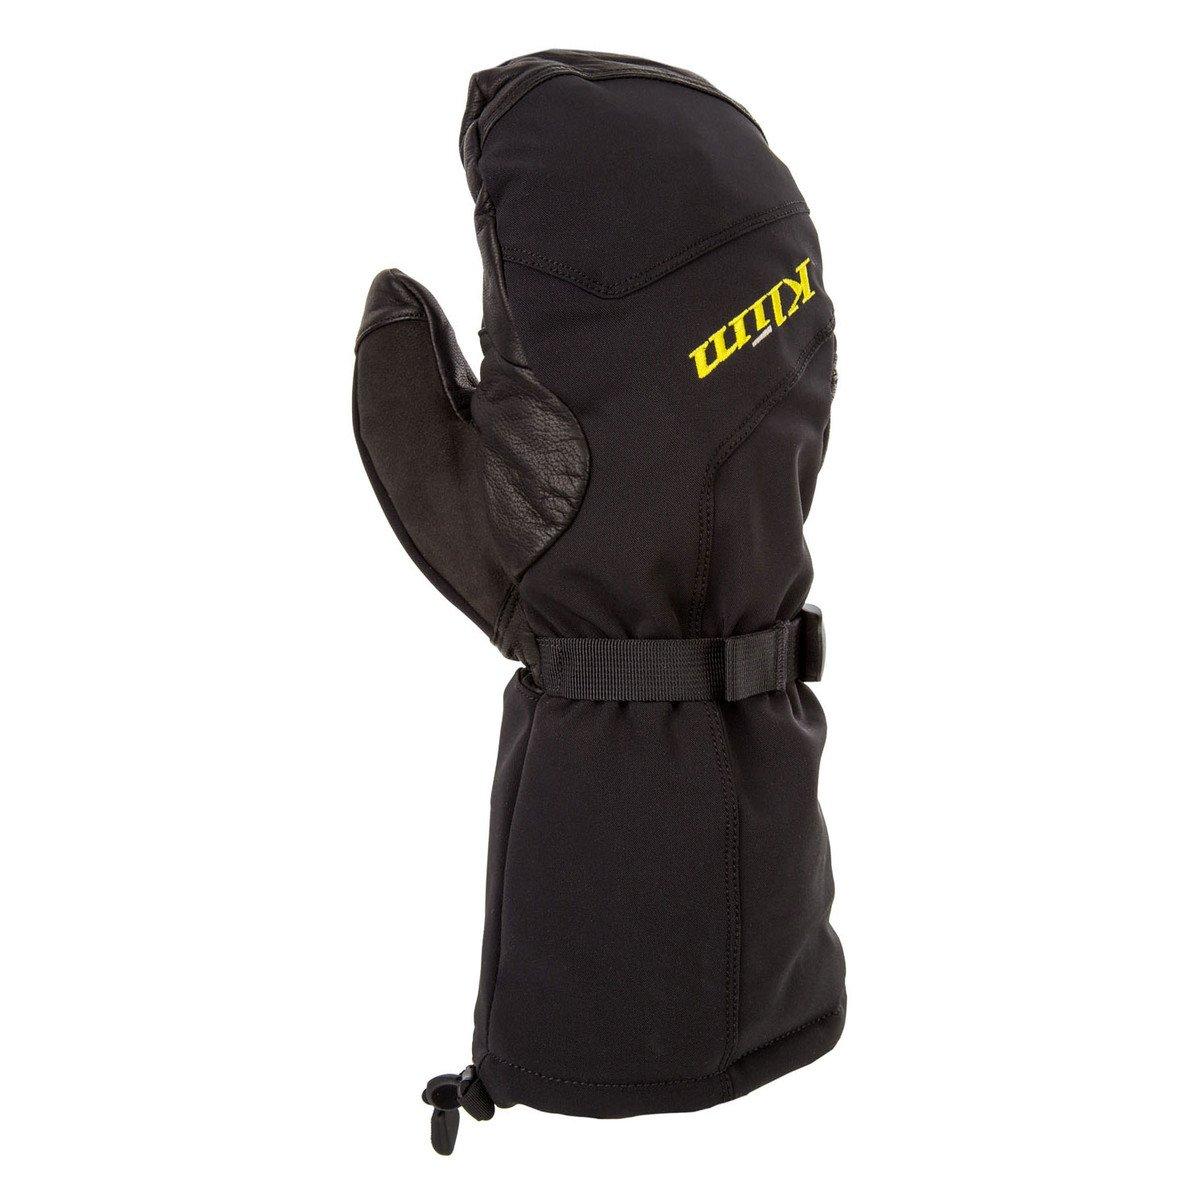 KLIM Caribou GORE-TEX Waterproof Snowmobiling Mitten - Black (SM)